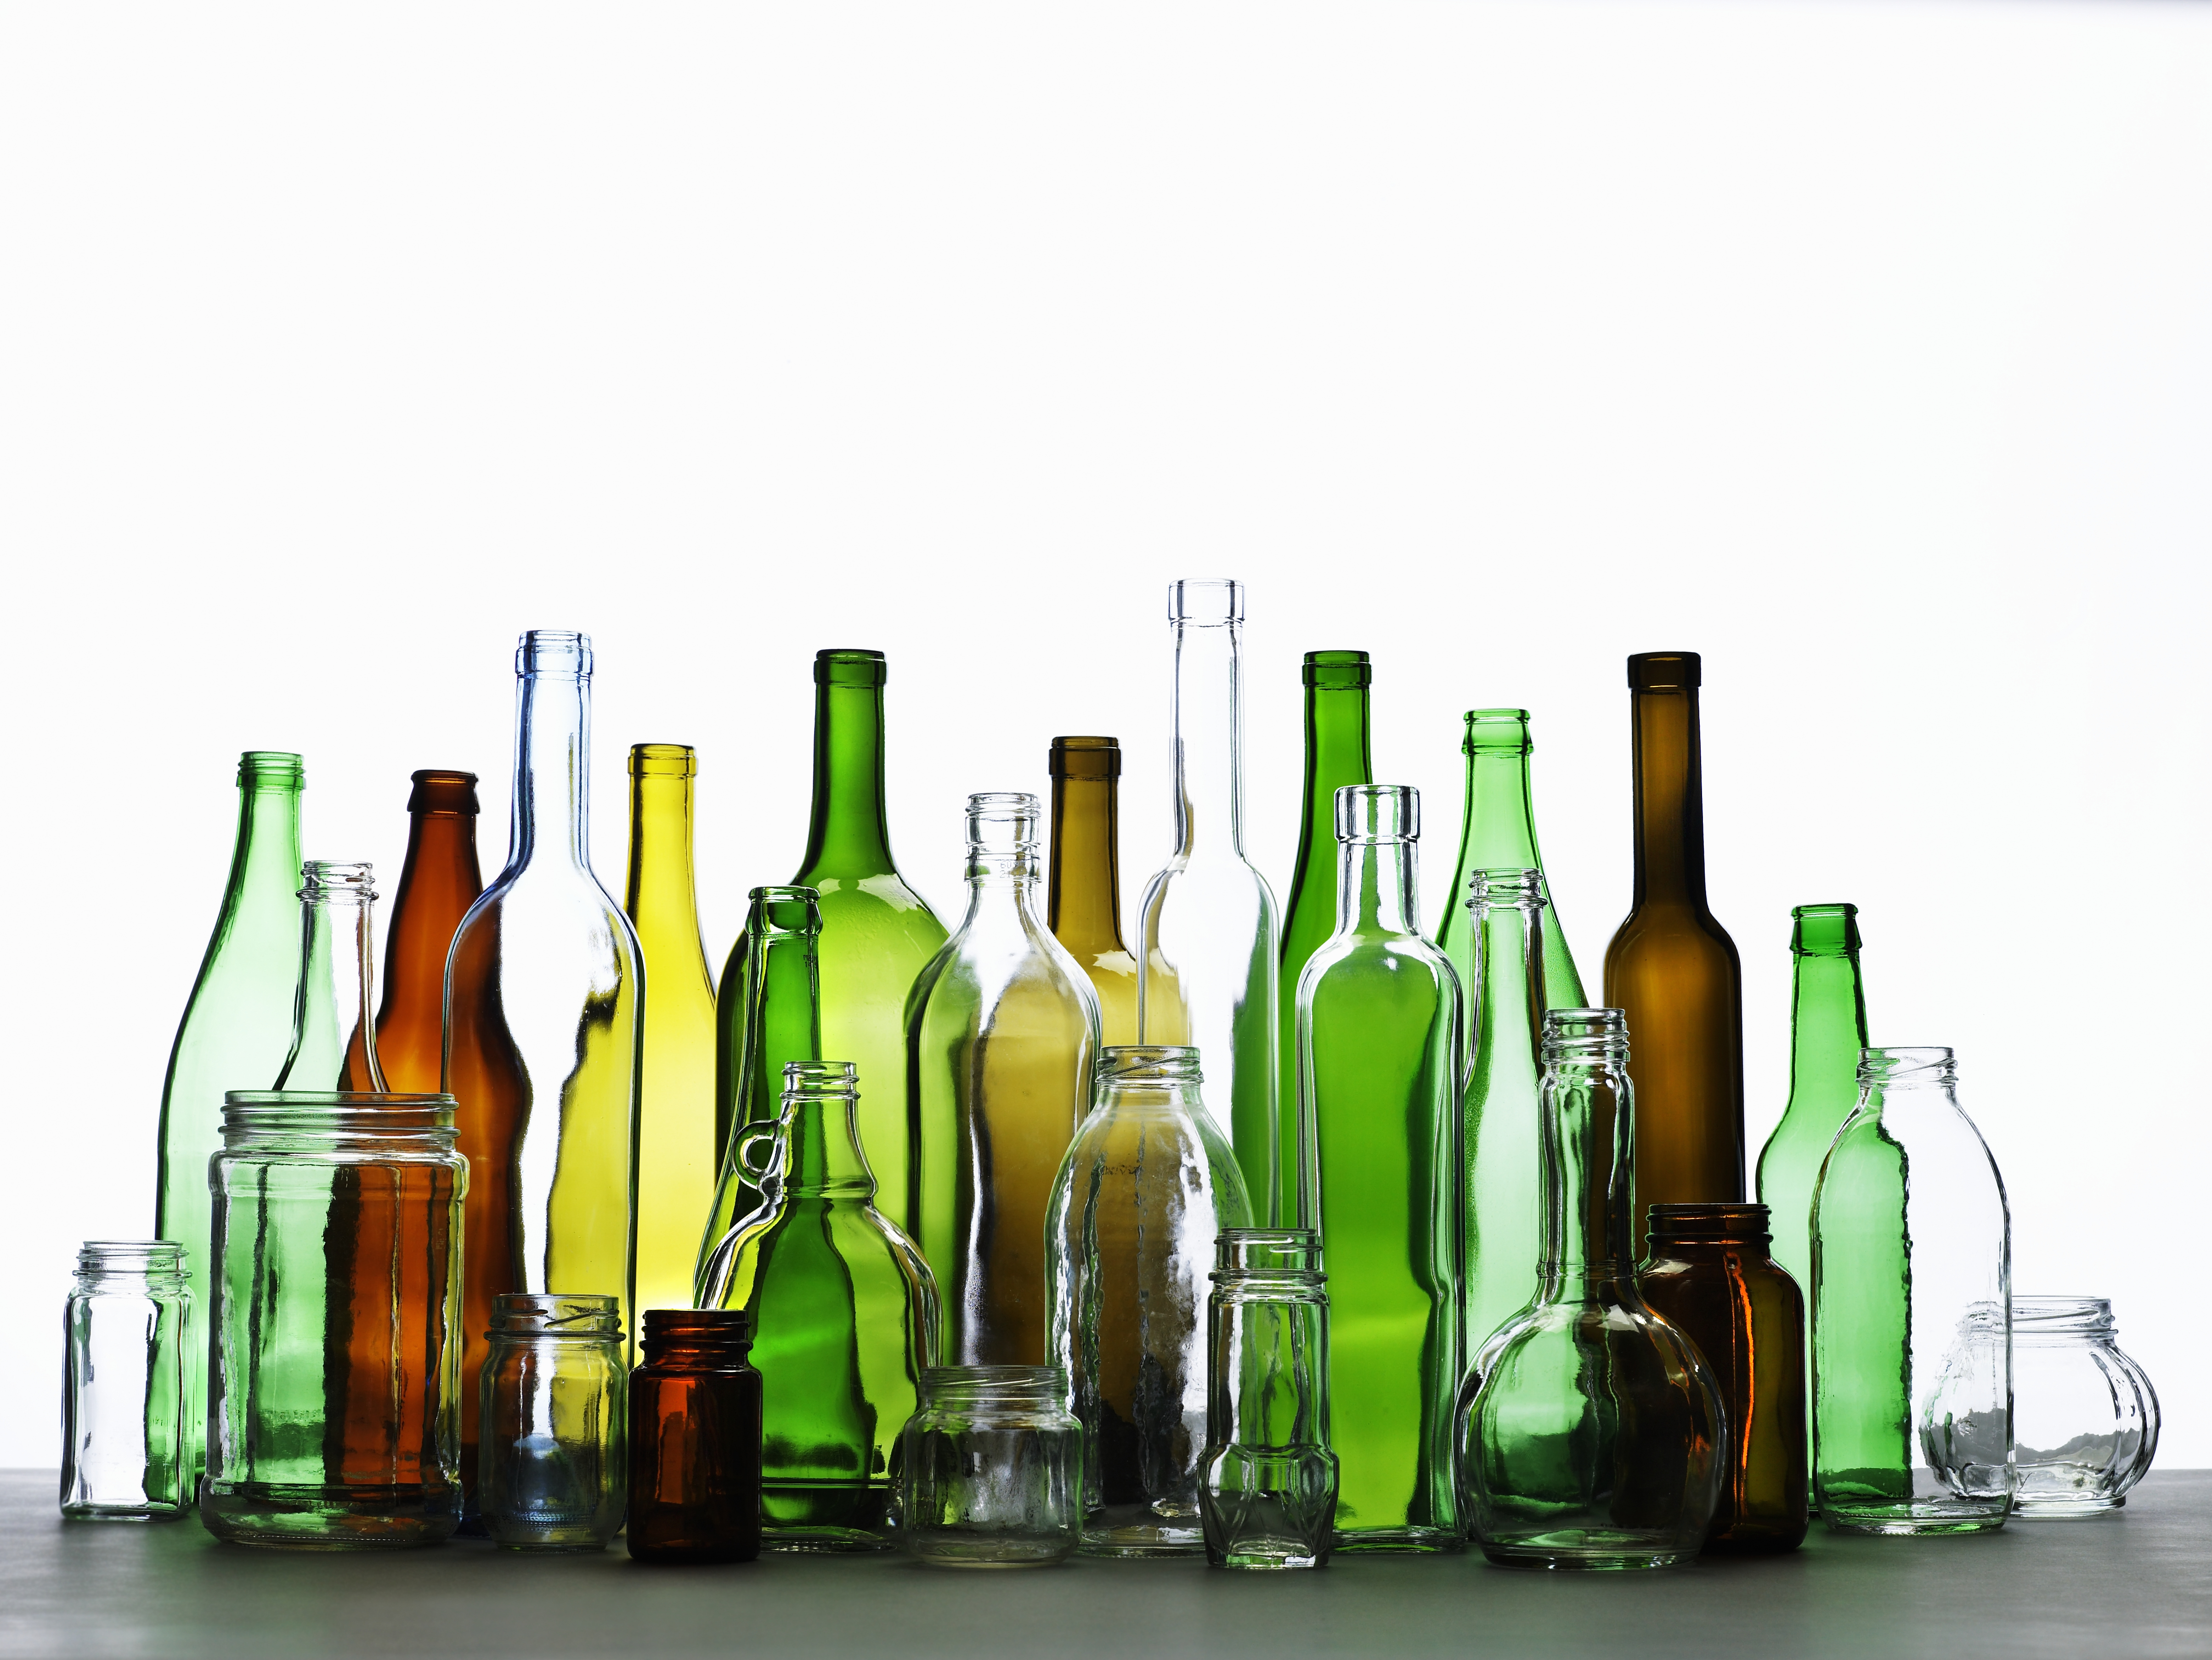 Фото бутылки банки в попе 4 фотография